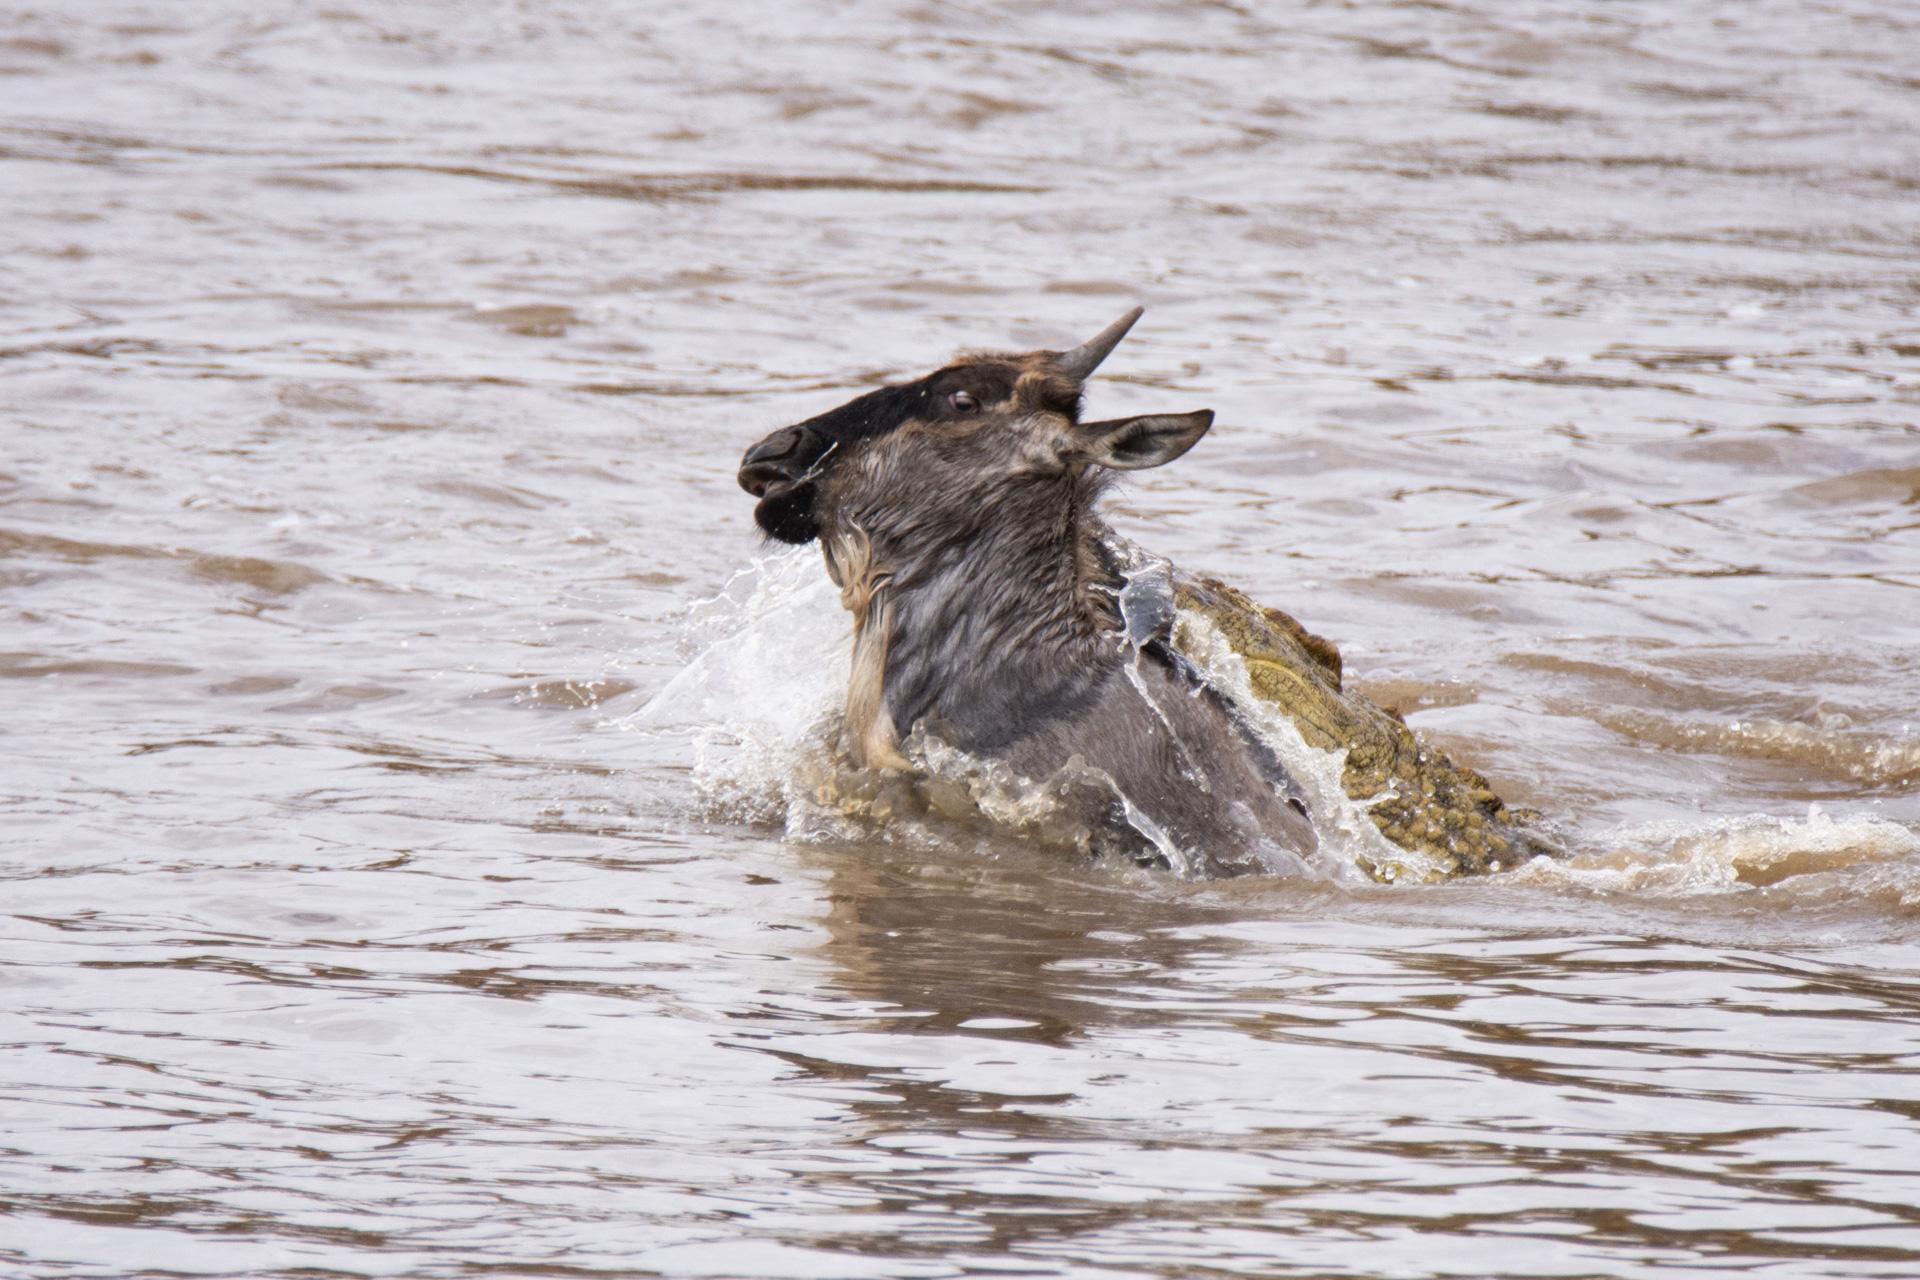 croc taking wilde